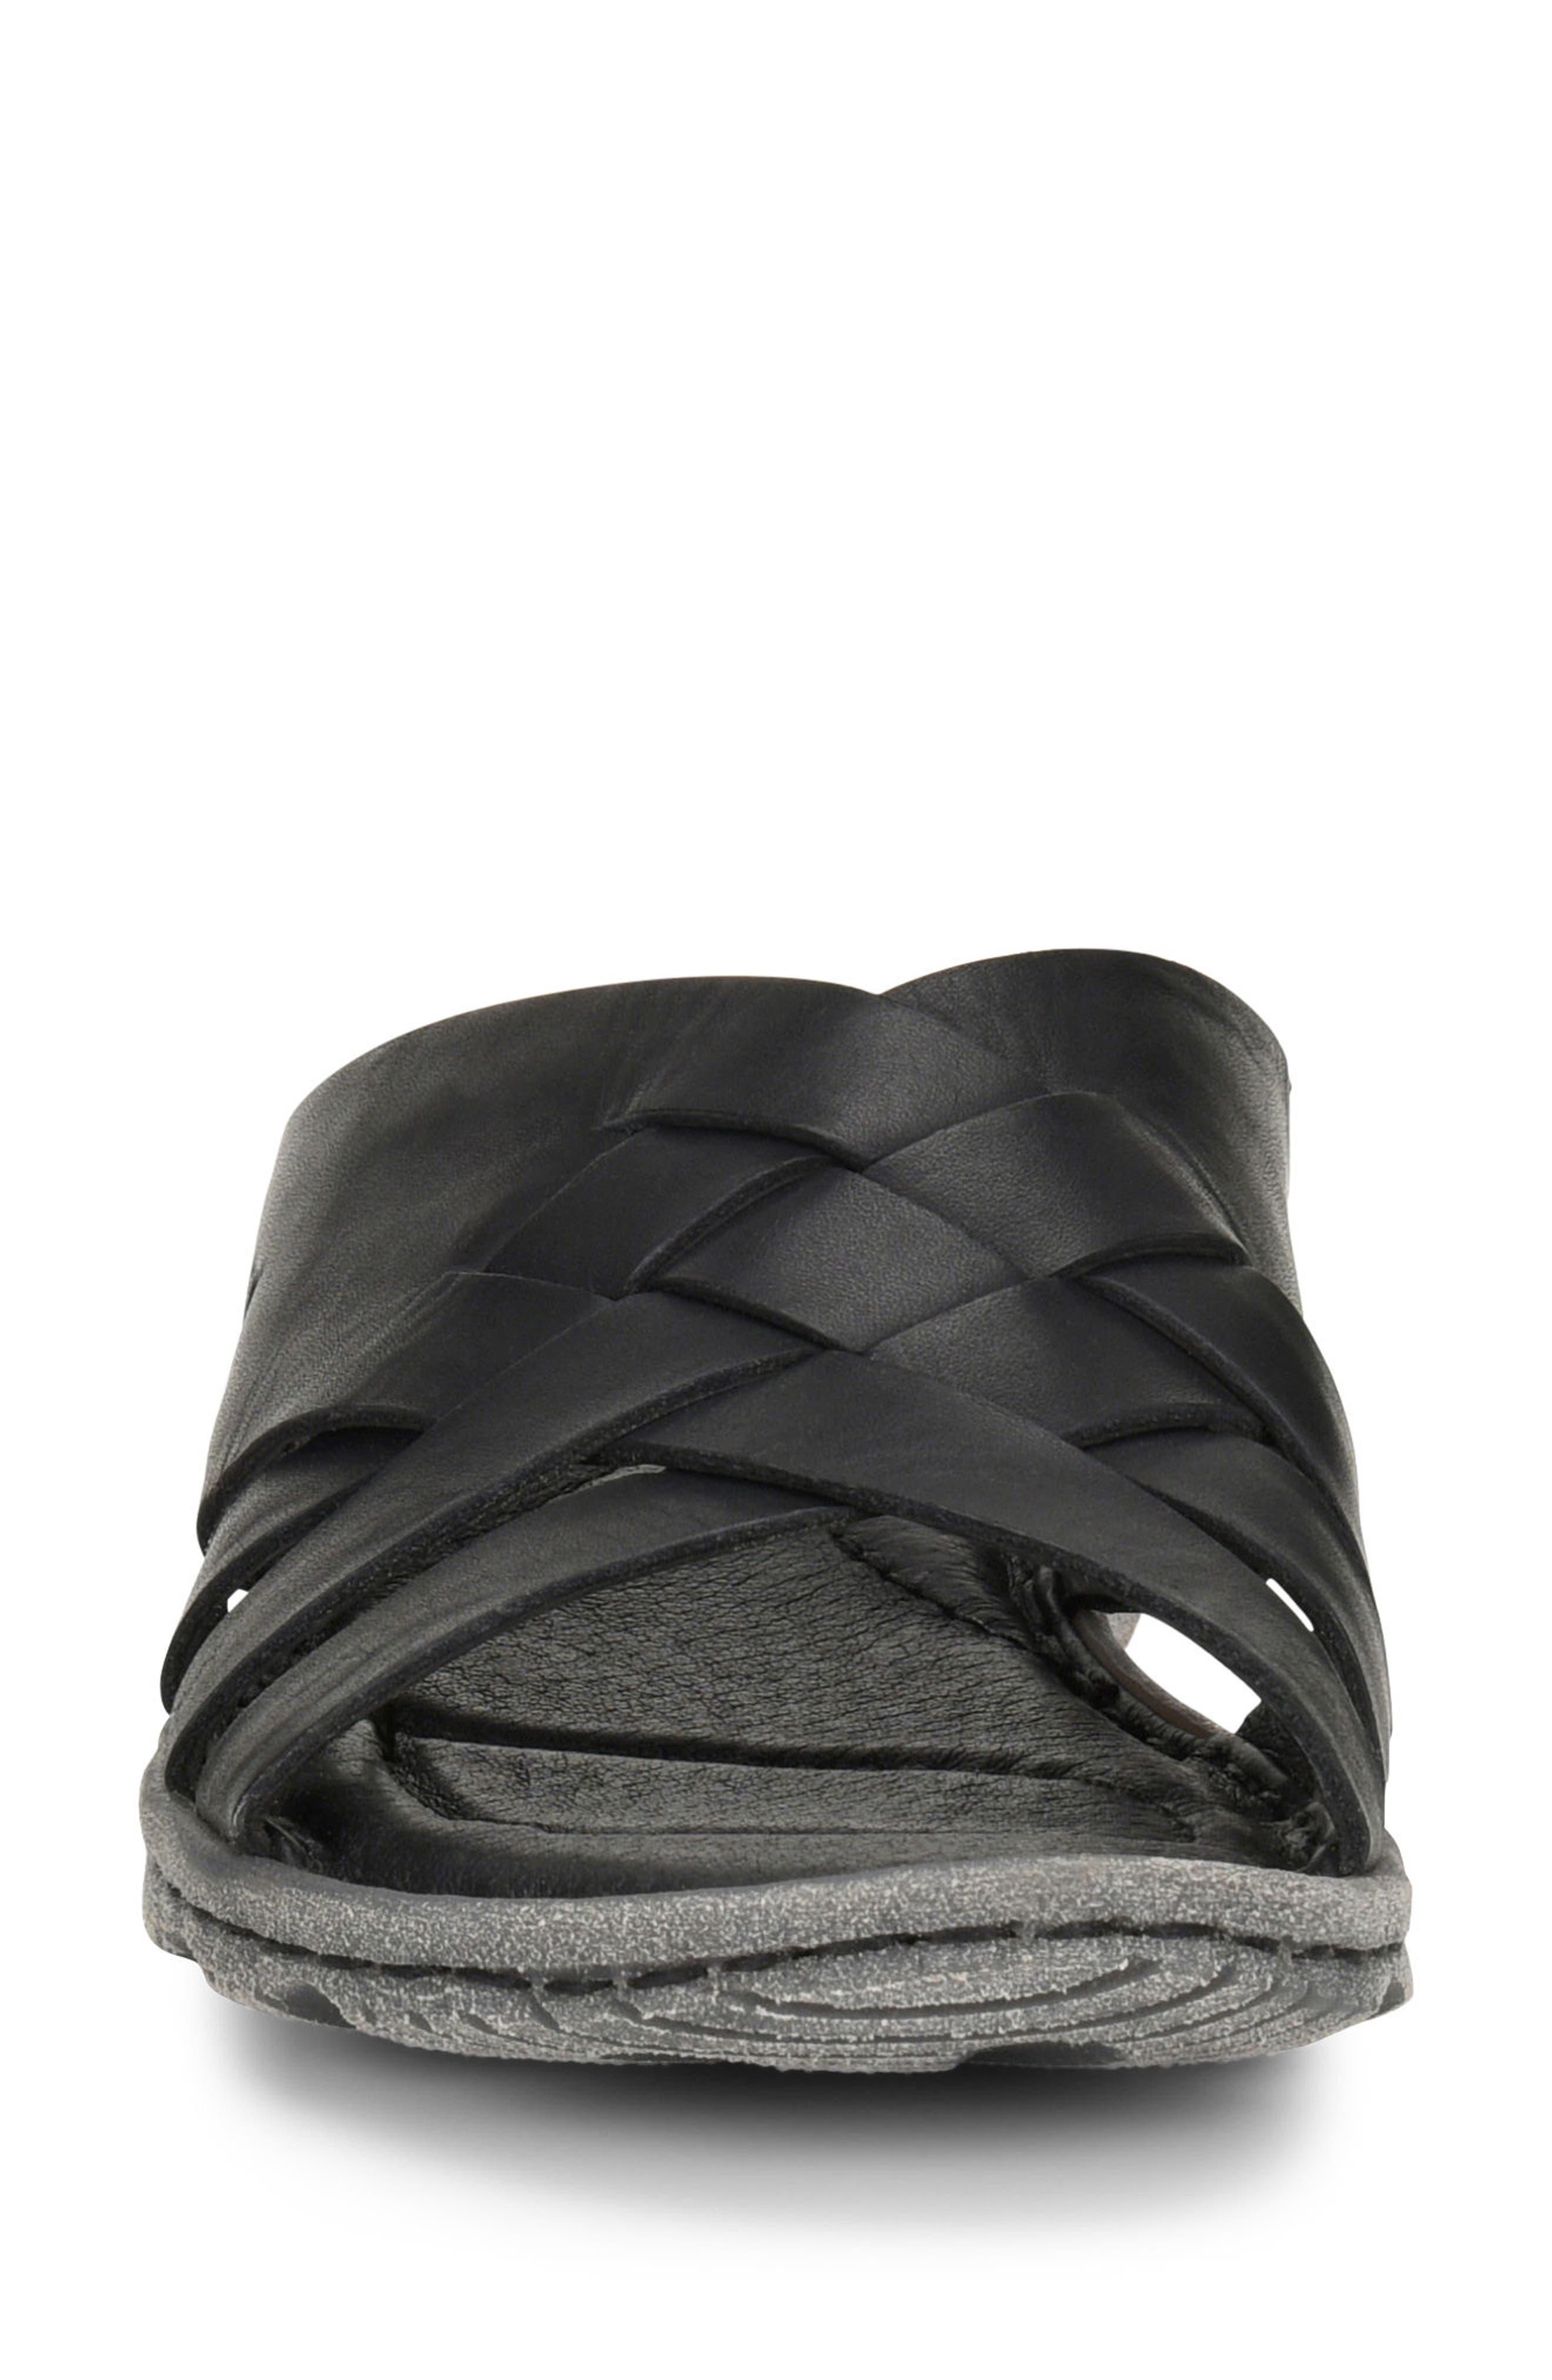 Tarpon Slide Sandal,                             Alternate thumbnail 4, color,                             001